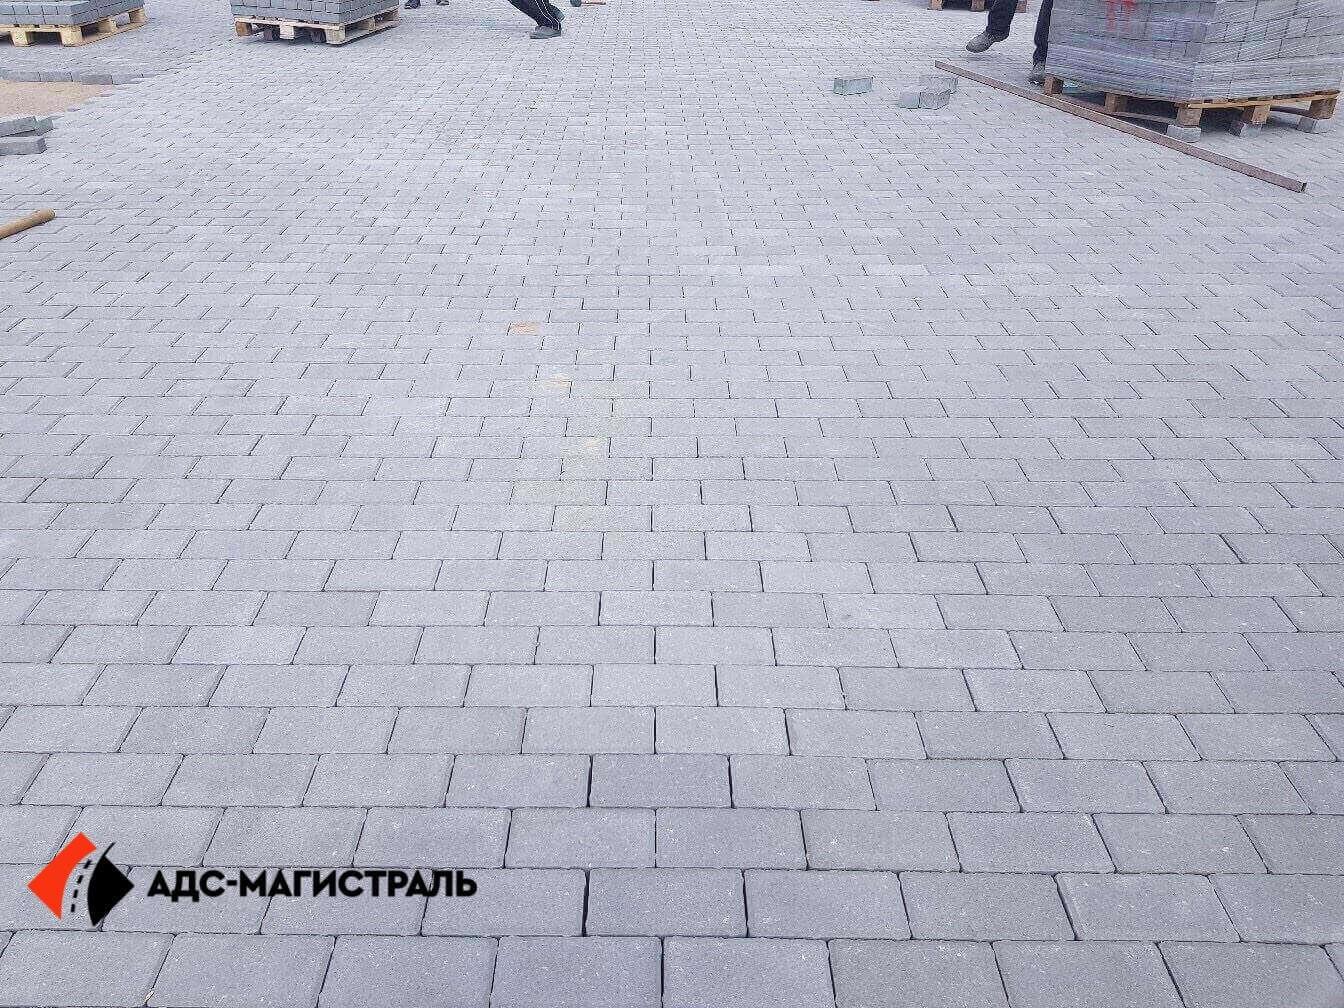 укладка тротуарной плитки Леруа Мерлен фото 9